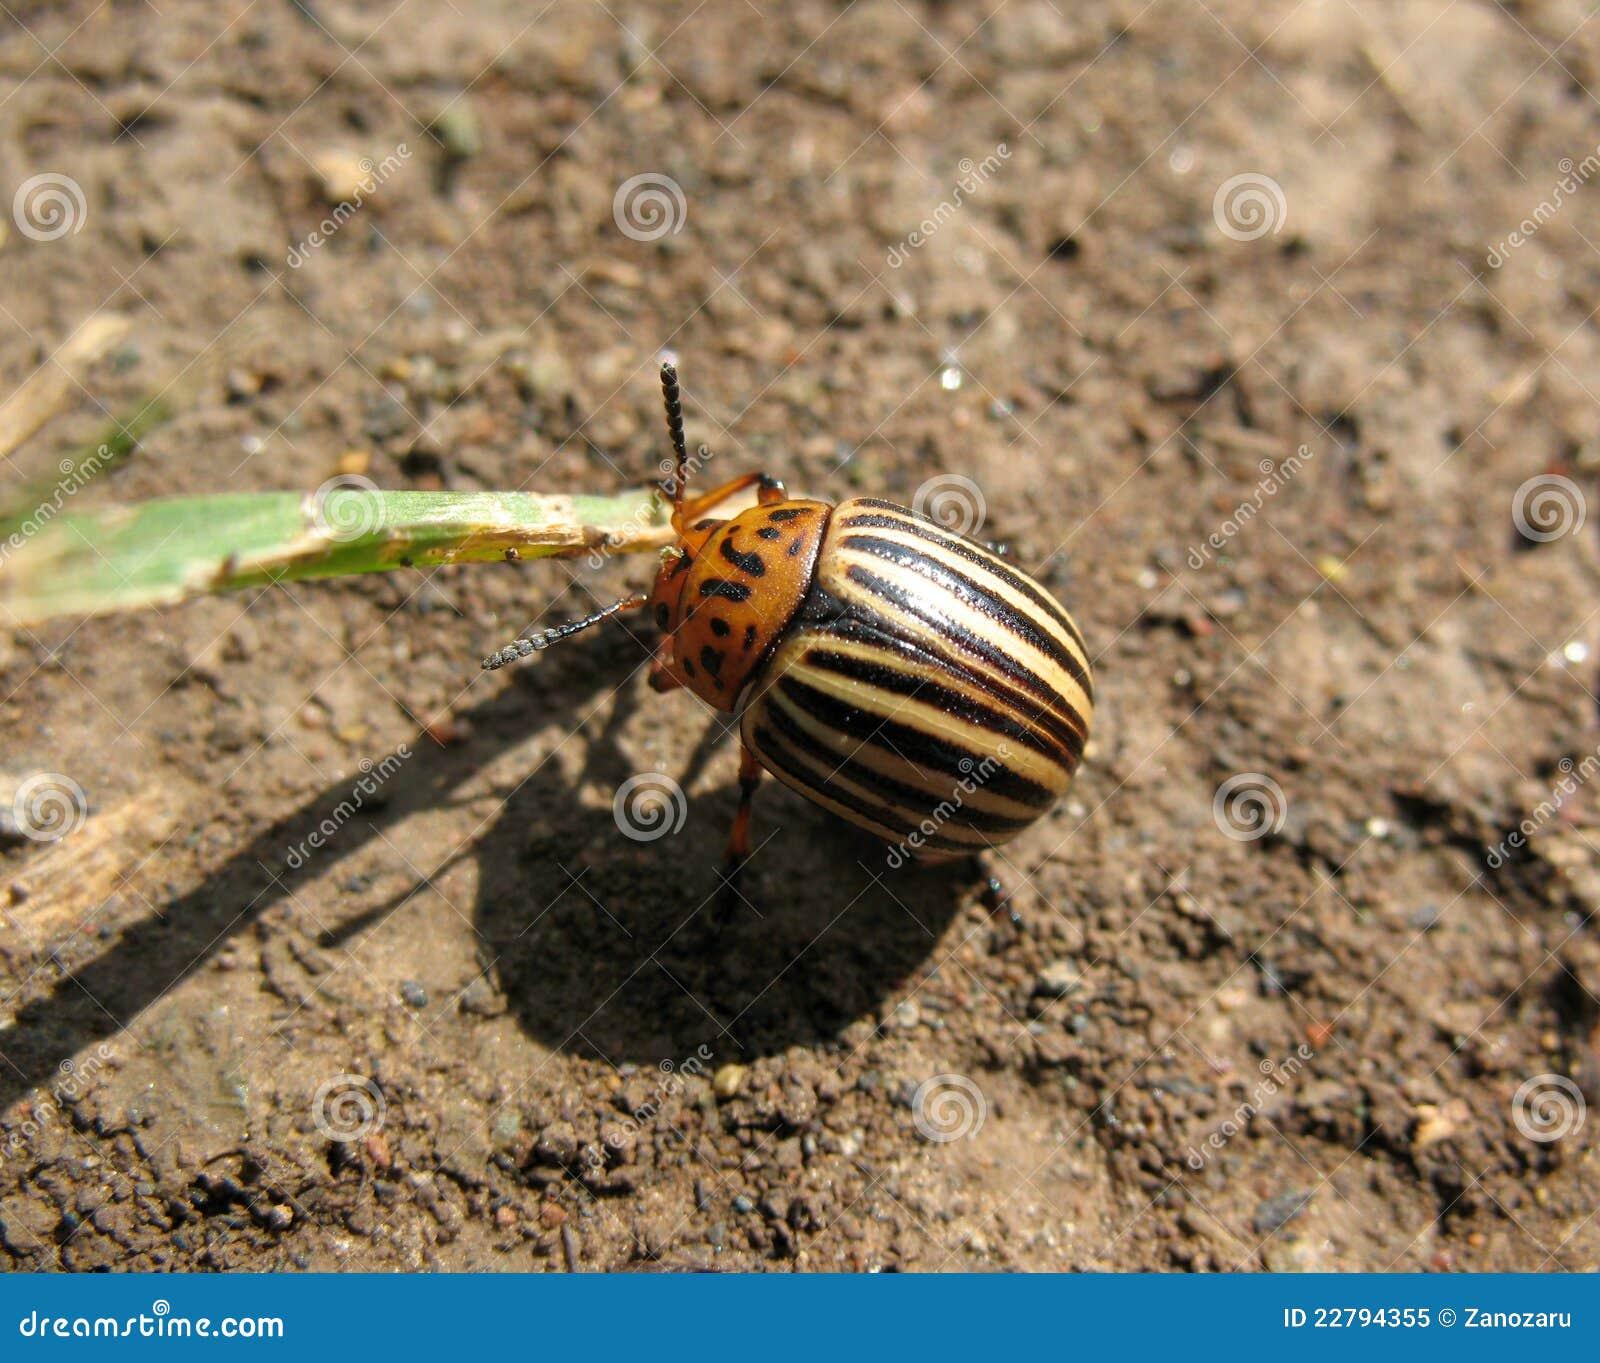 Colorado Potato Beetle Stock Image. Image Of Striped